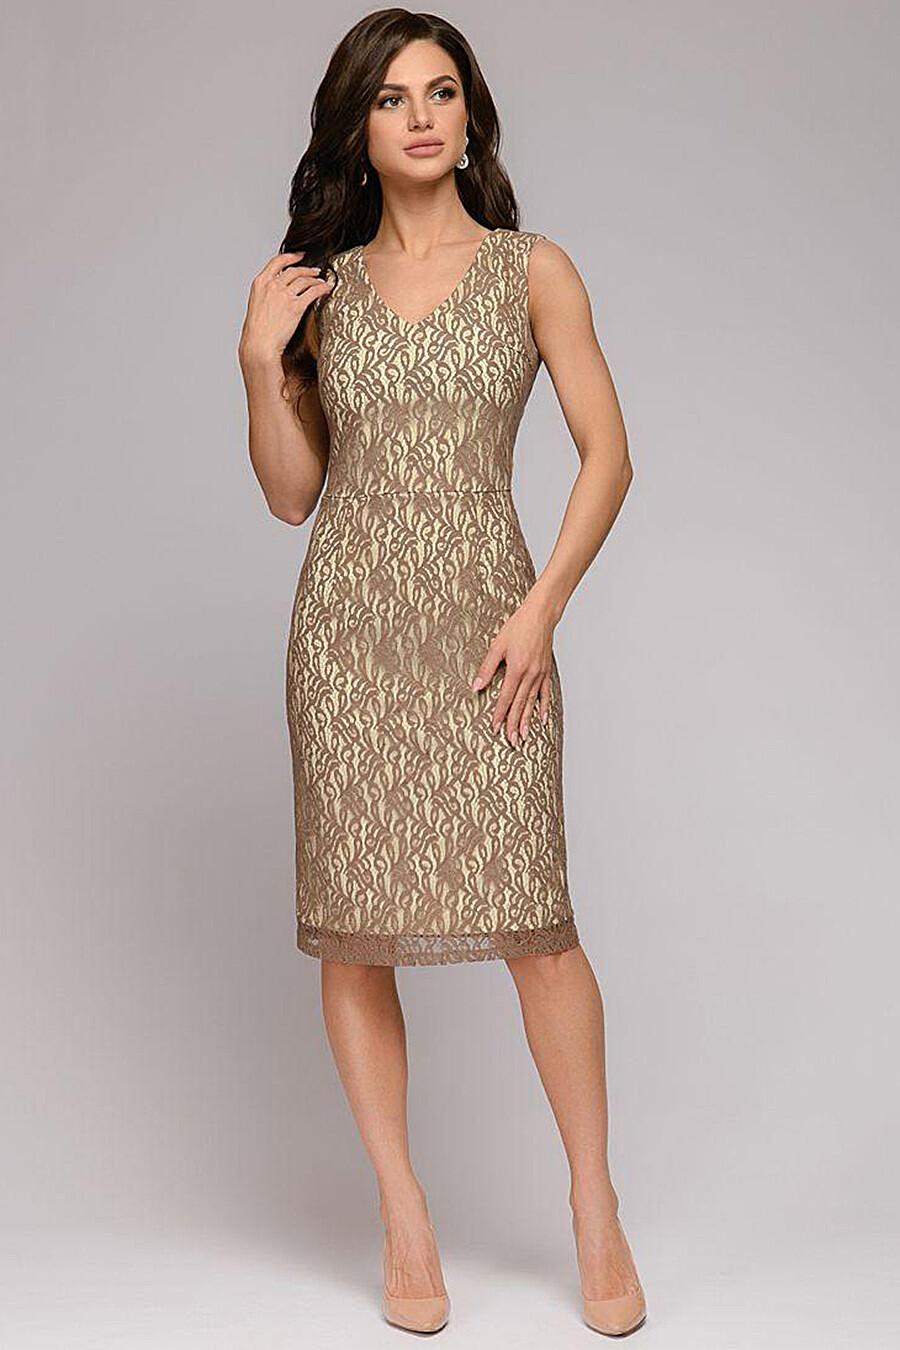 1001 Платье Футляр